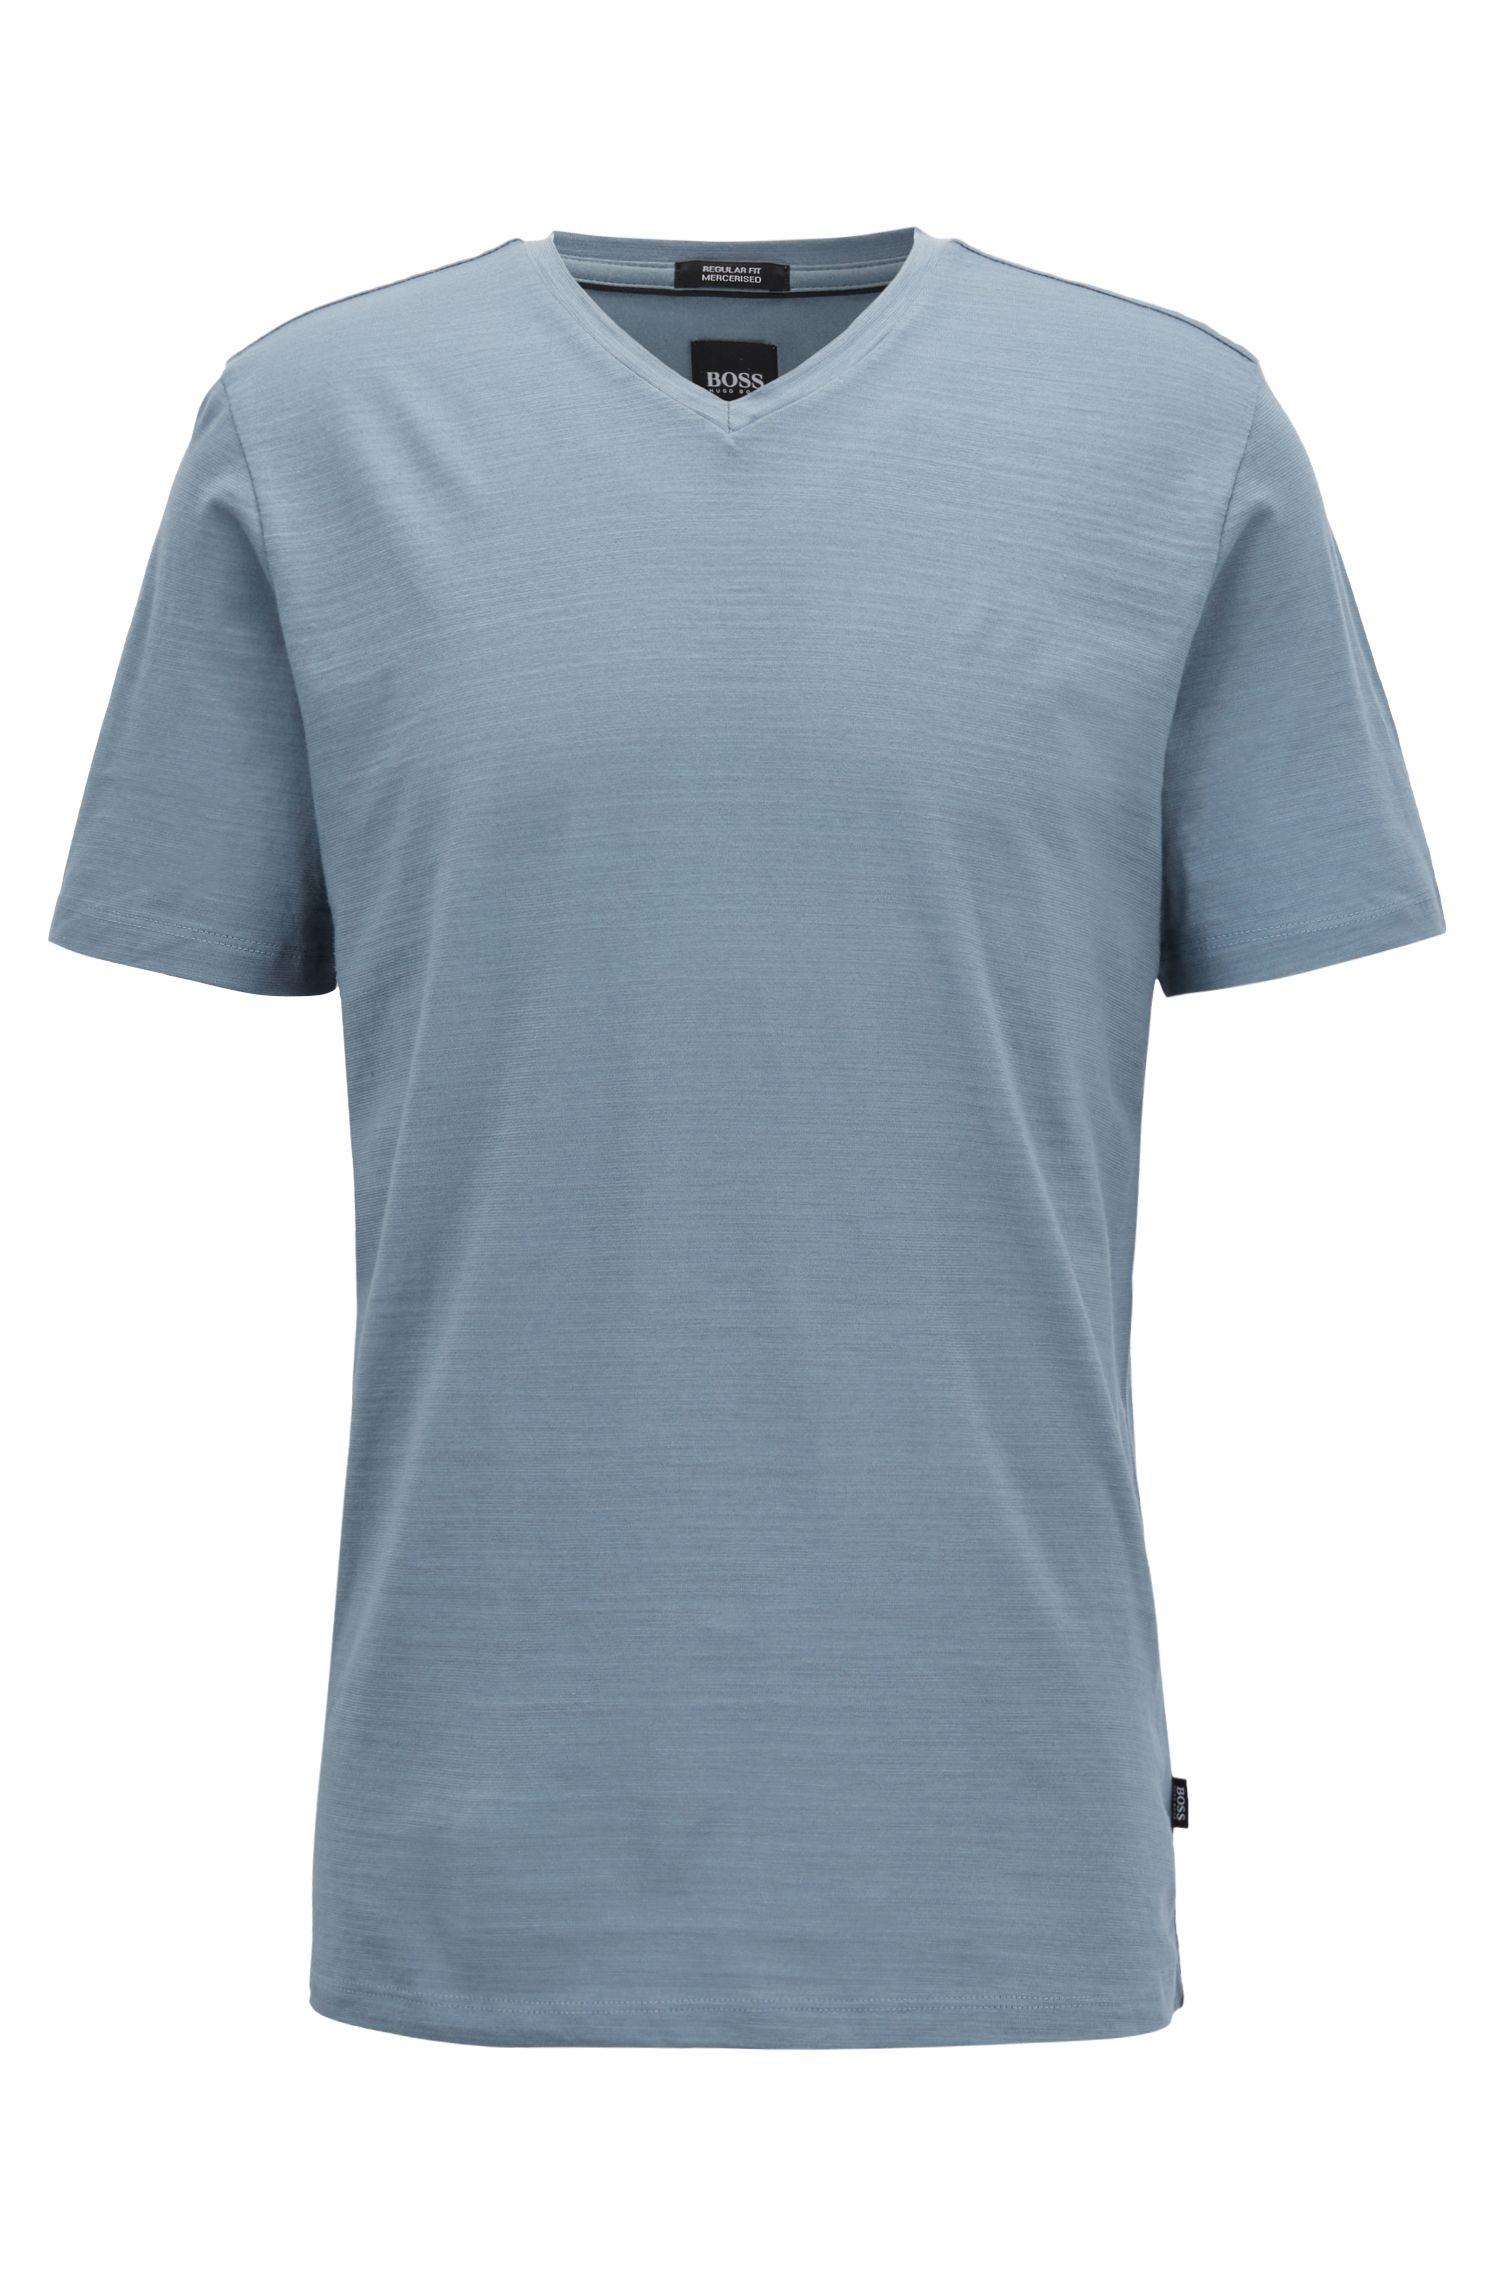 Regular-fit T-shirt in mercerized cotton, Open Blue